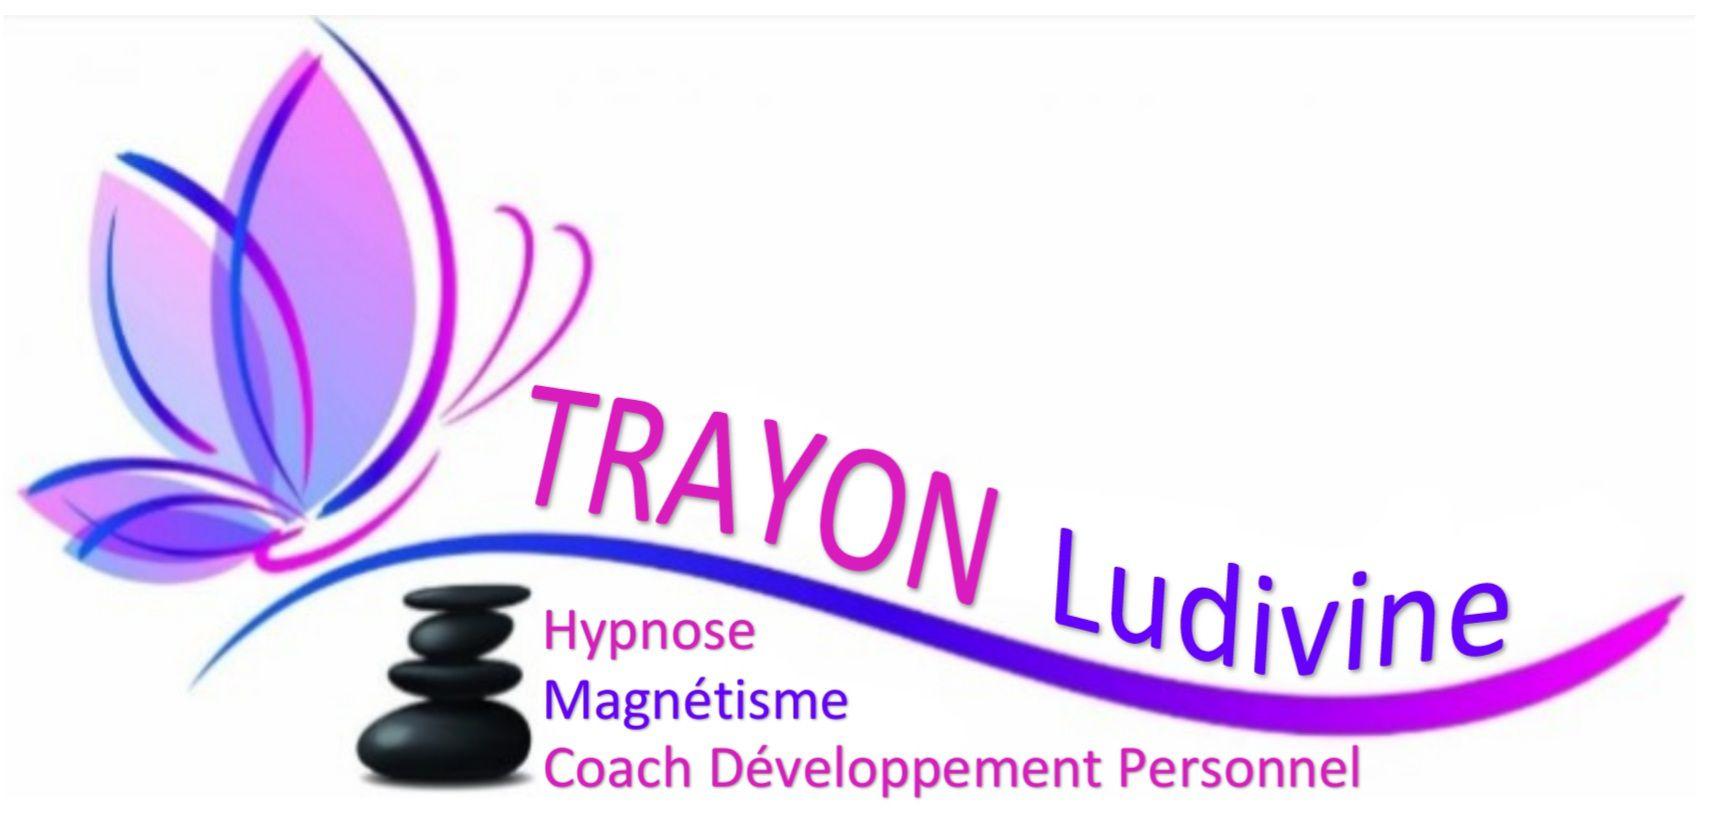 Logo Ludivine Trayon